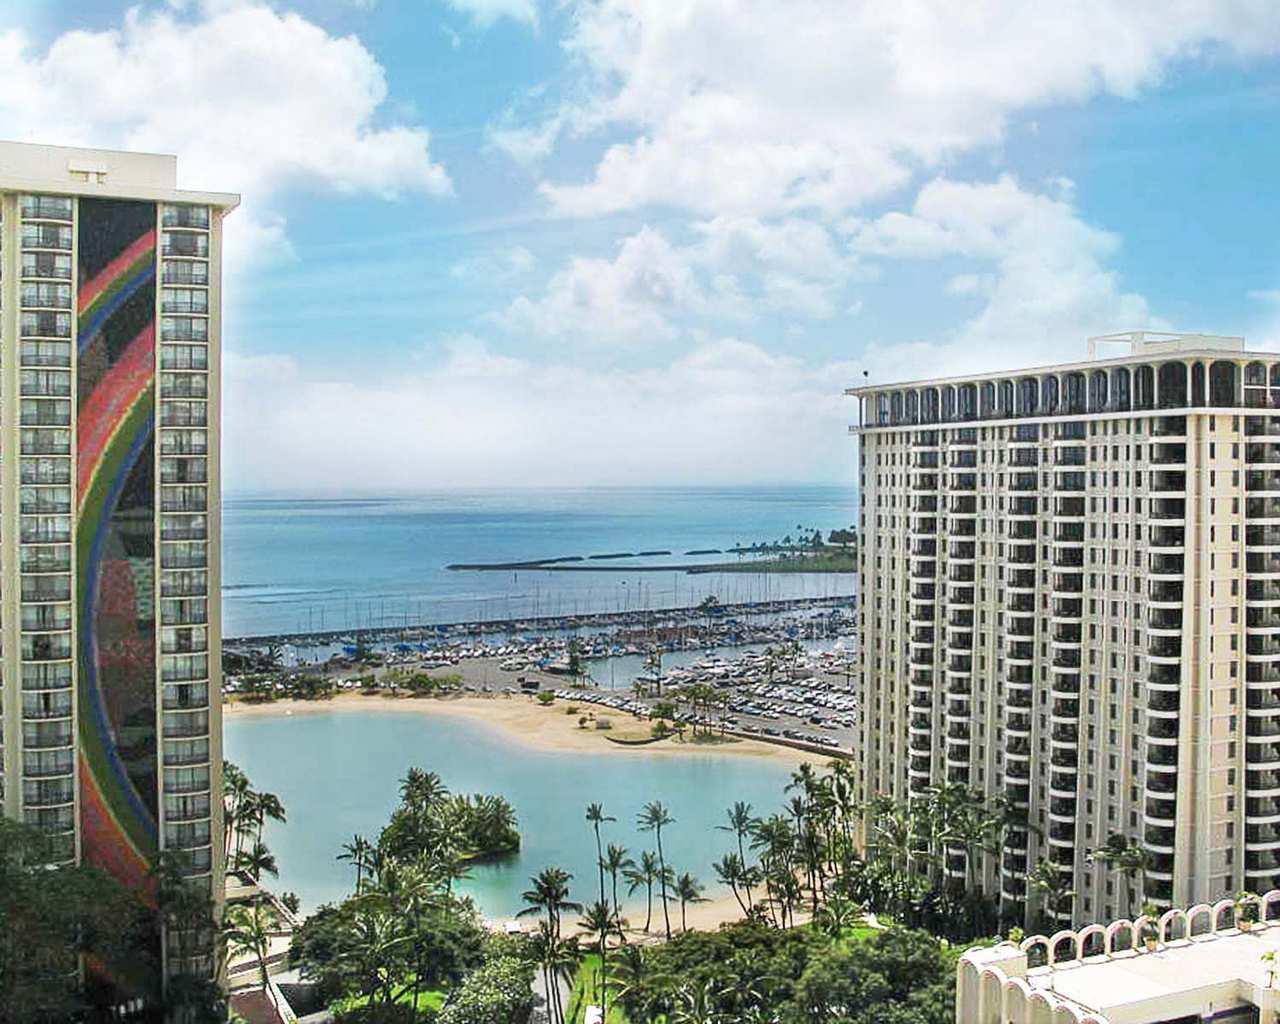 Enterprise Rental Car Waikiki Beach